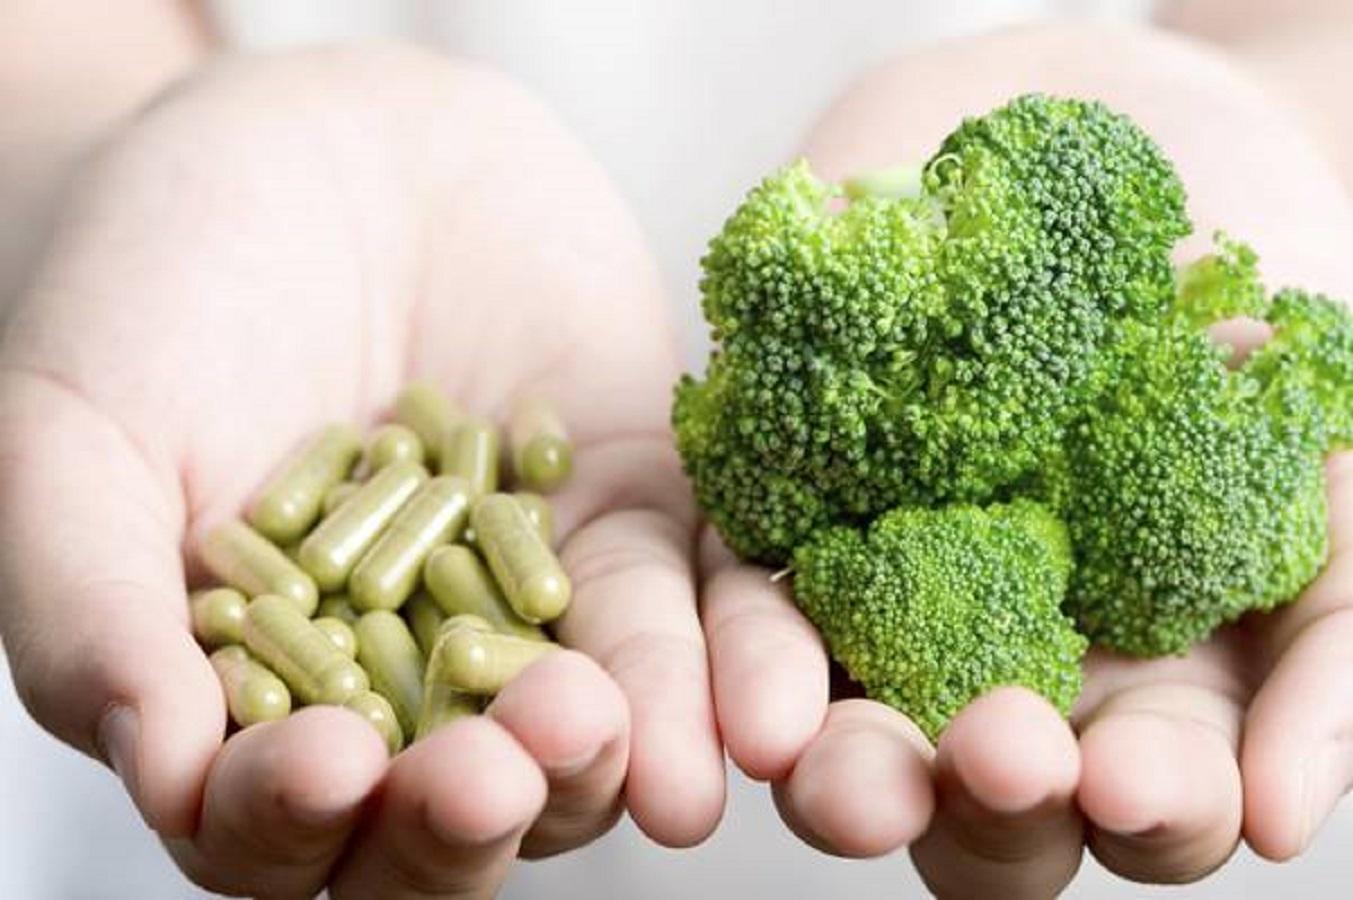 Vitamine, assumerne troppe può causare malattie gravi